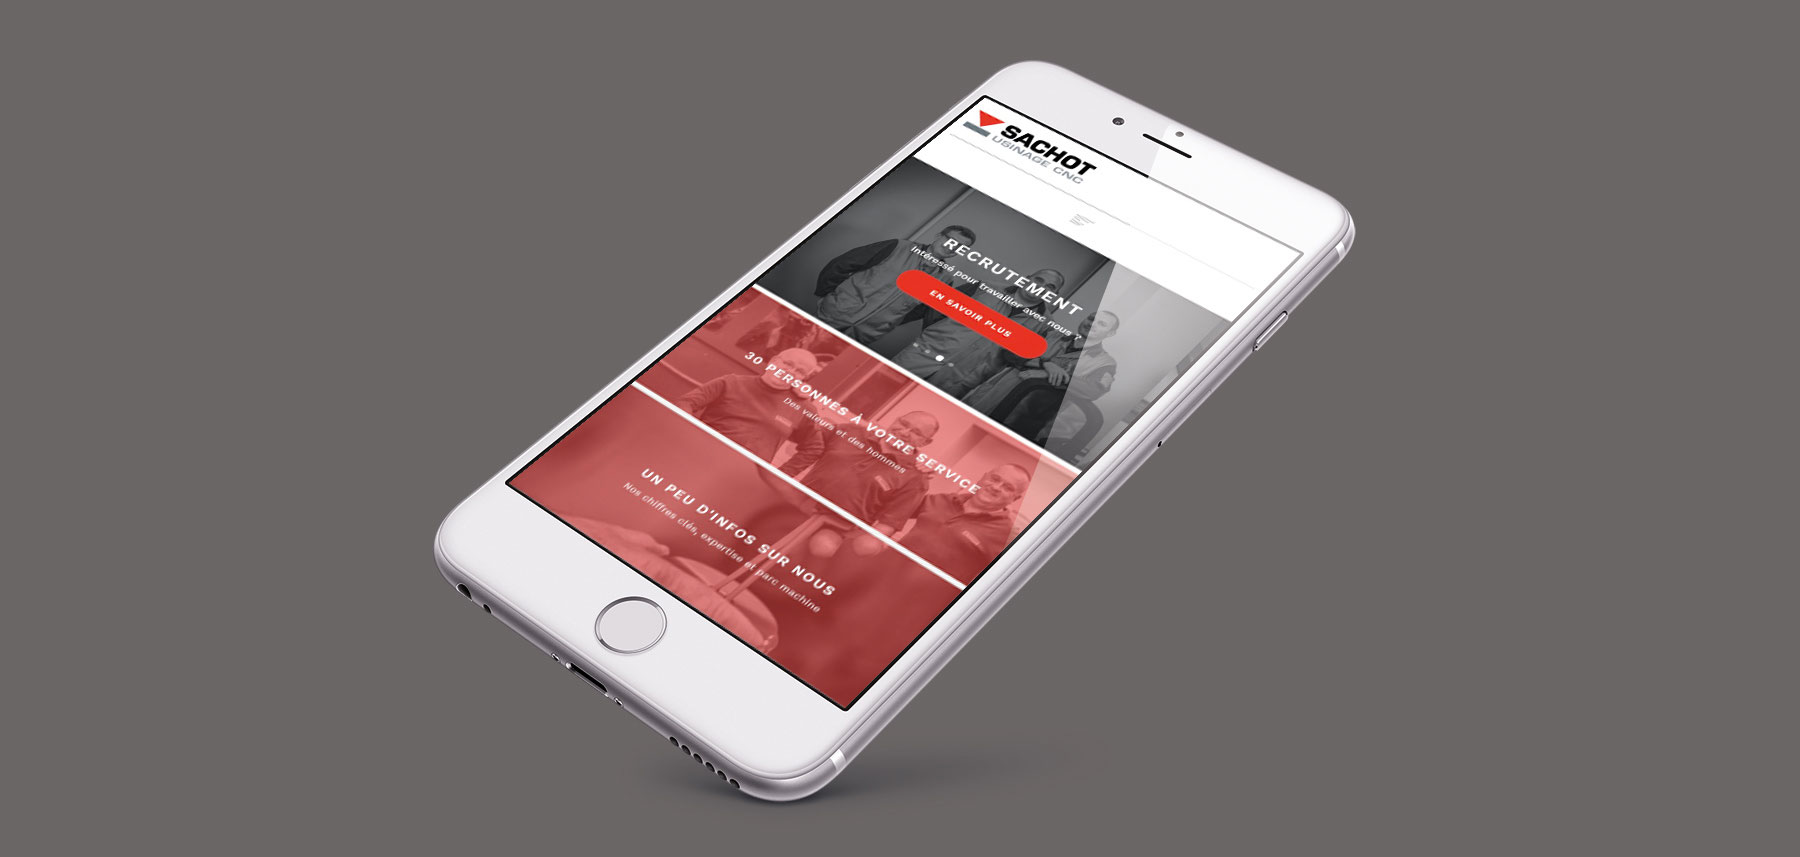 Sachot responsive design interface smartphone